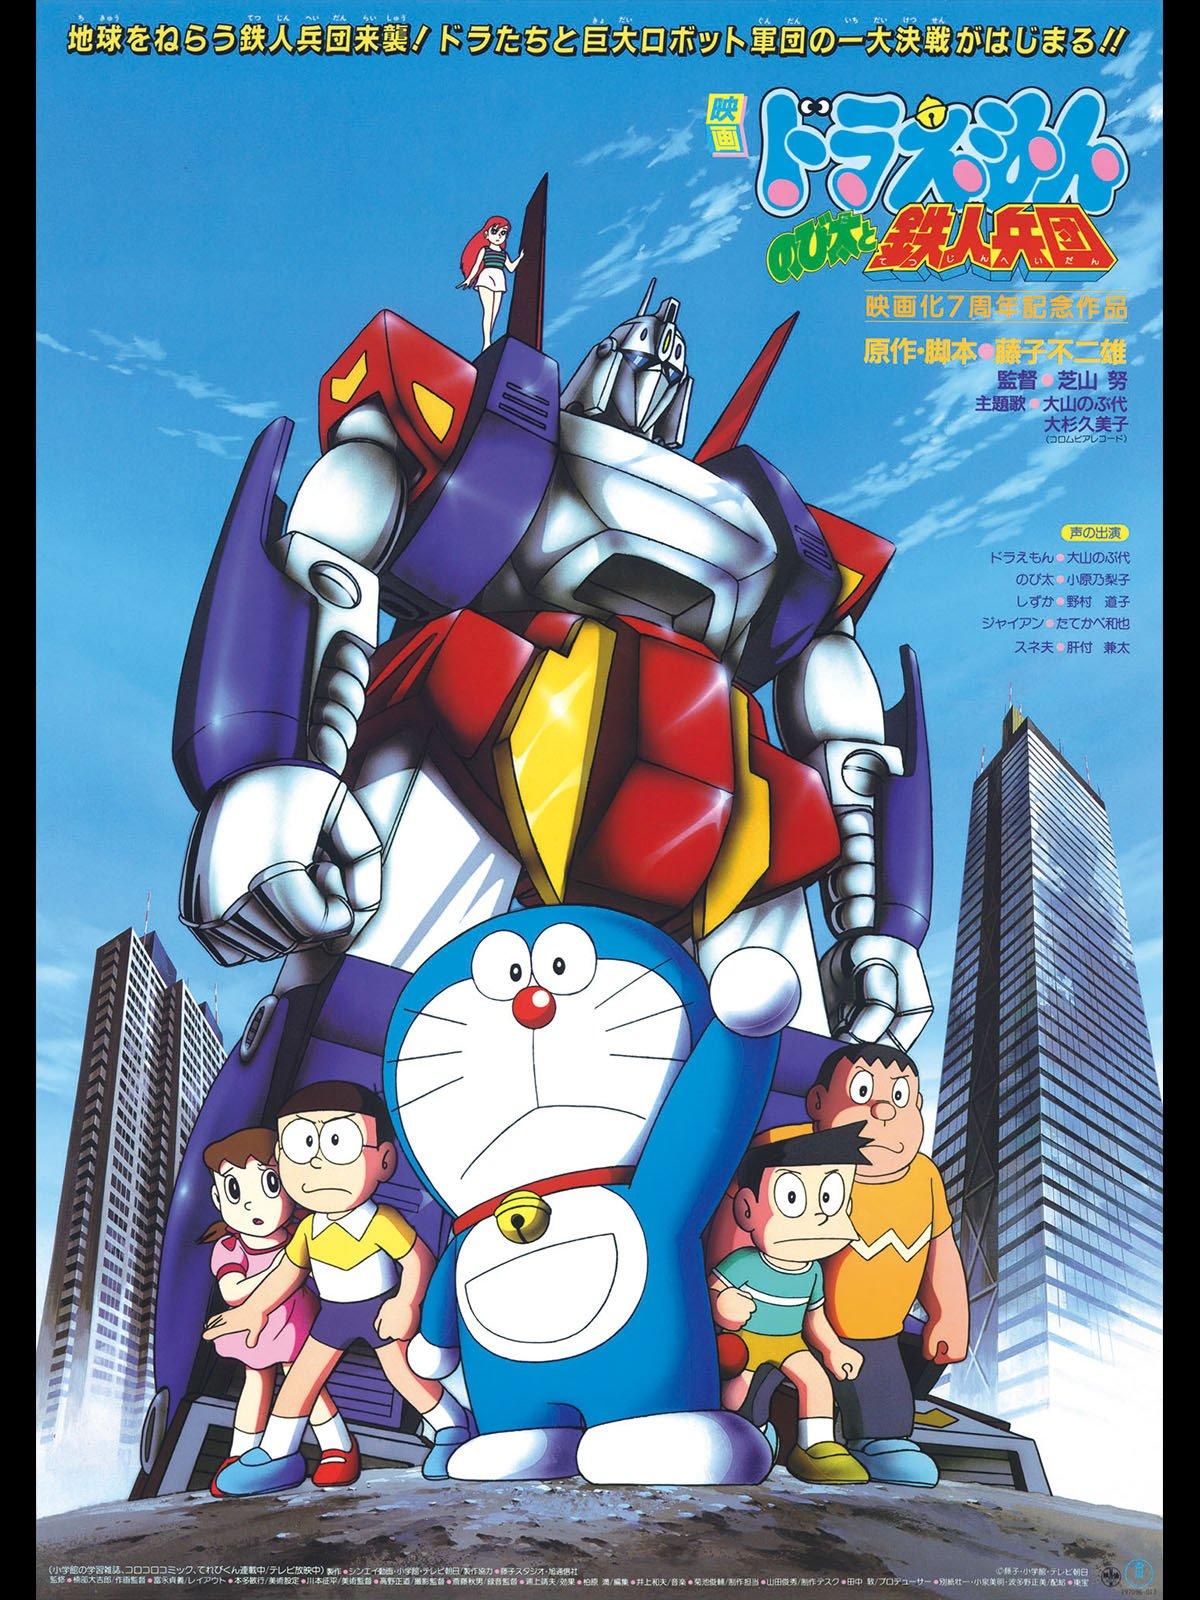 Doraemon: Nobita and the Steel Troops | Doraemon Wiki | FANDOM